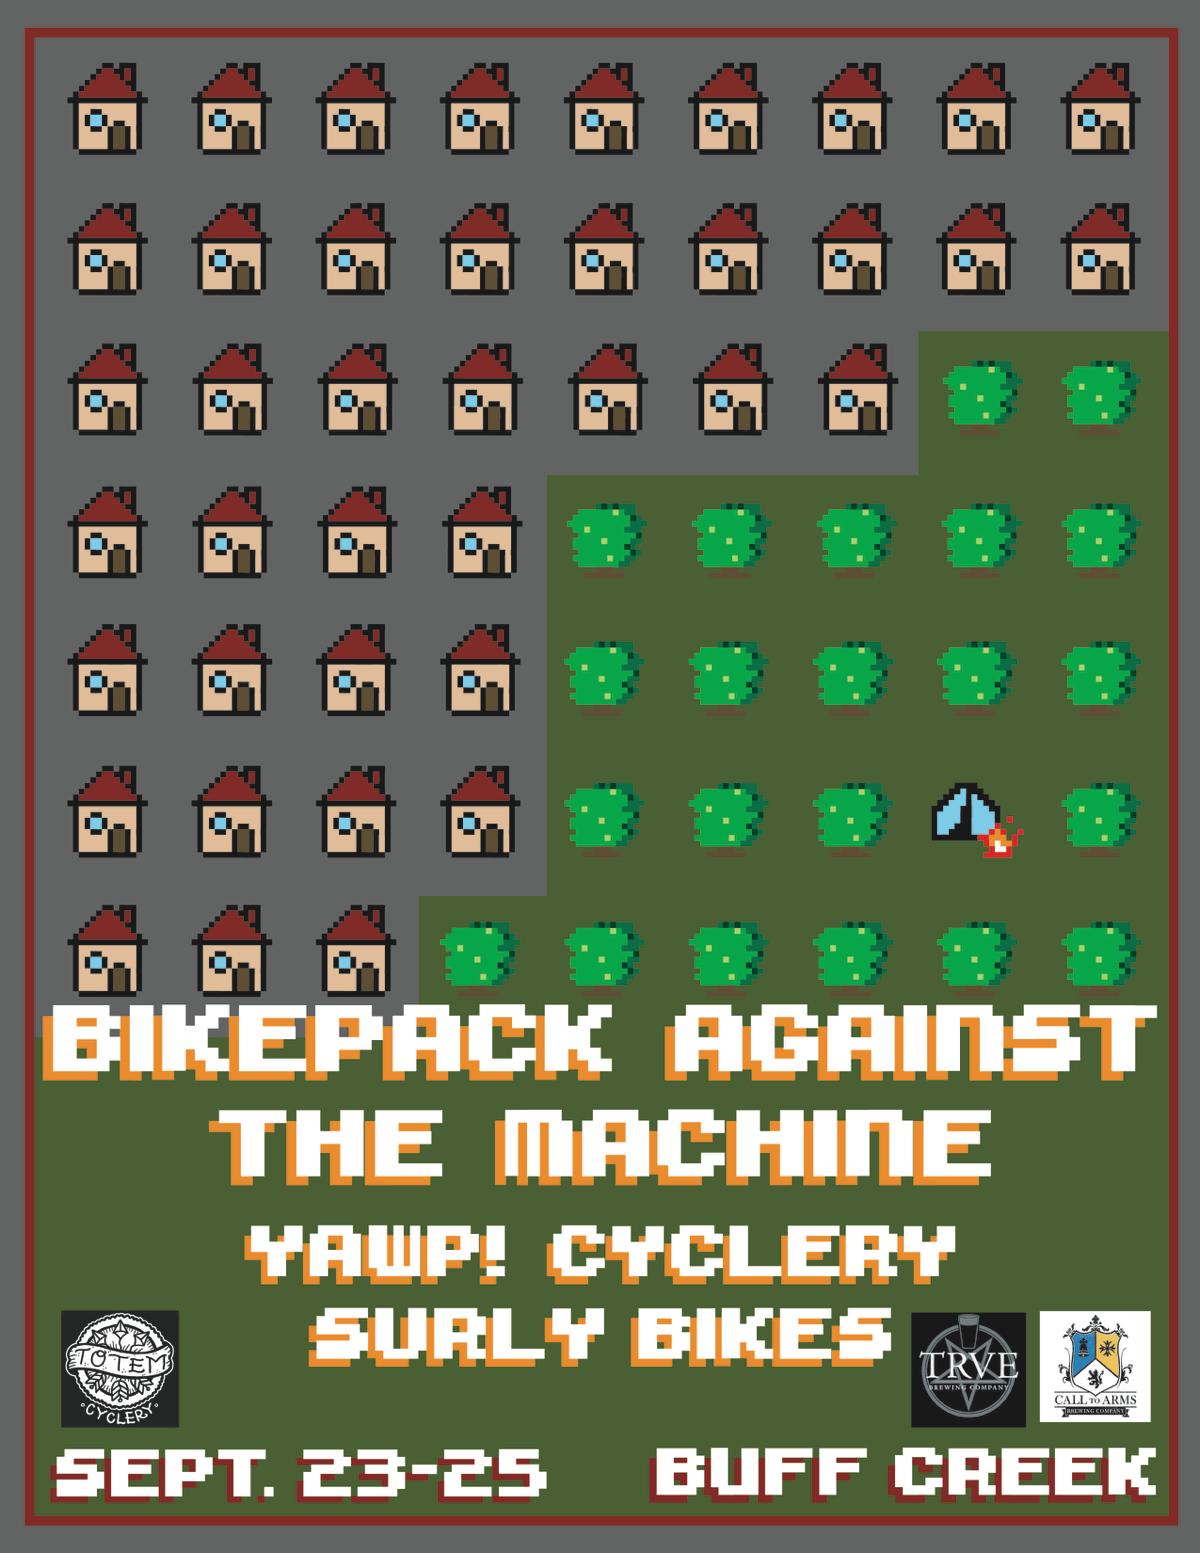 bikepacking-atm-2016-1